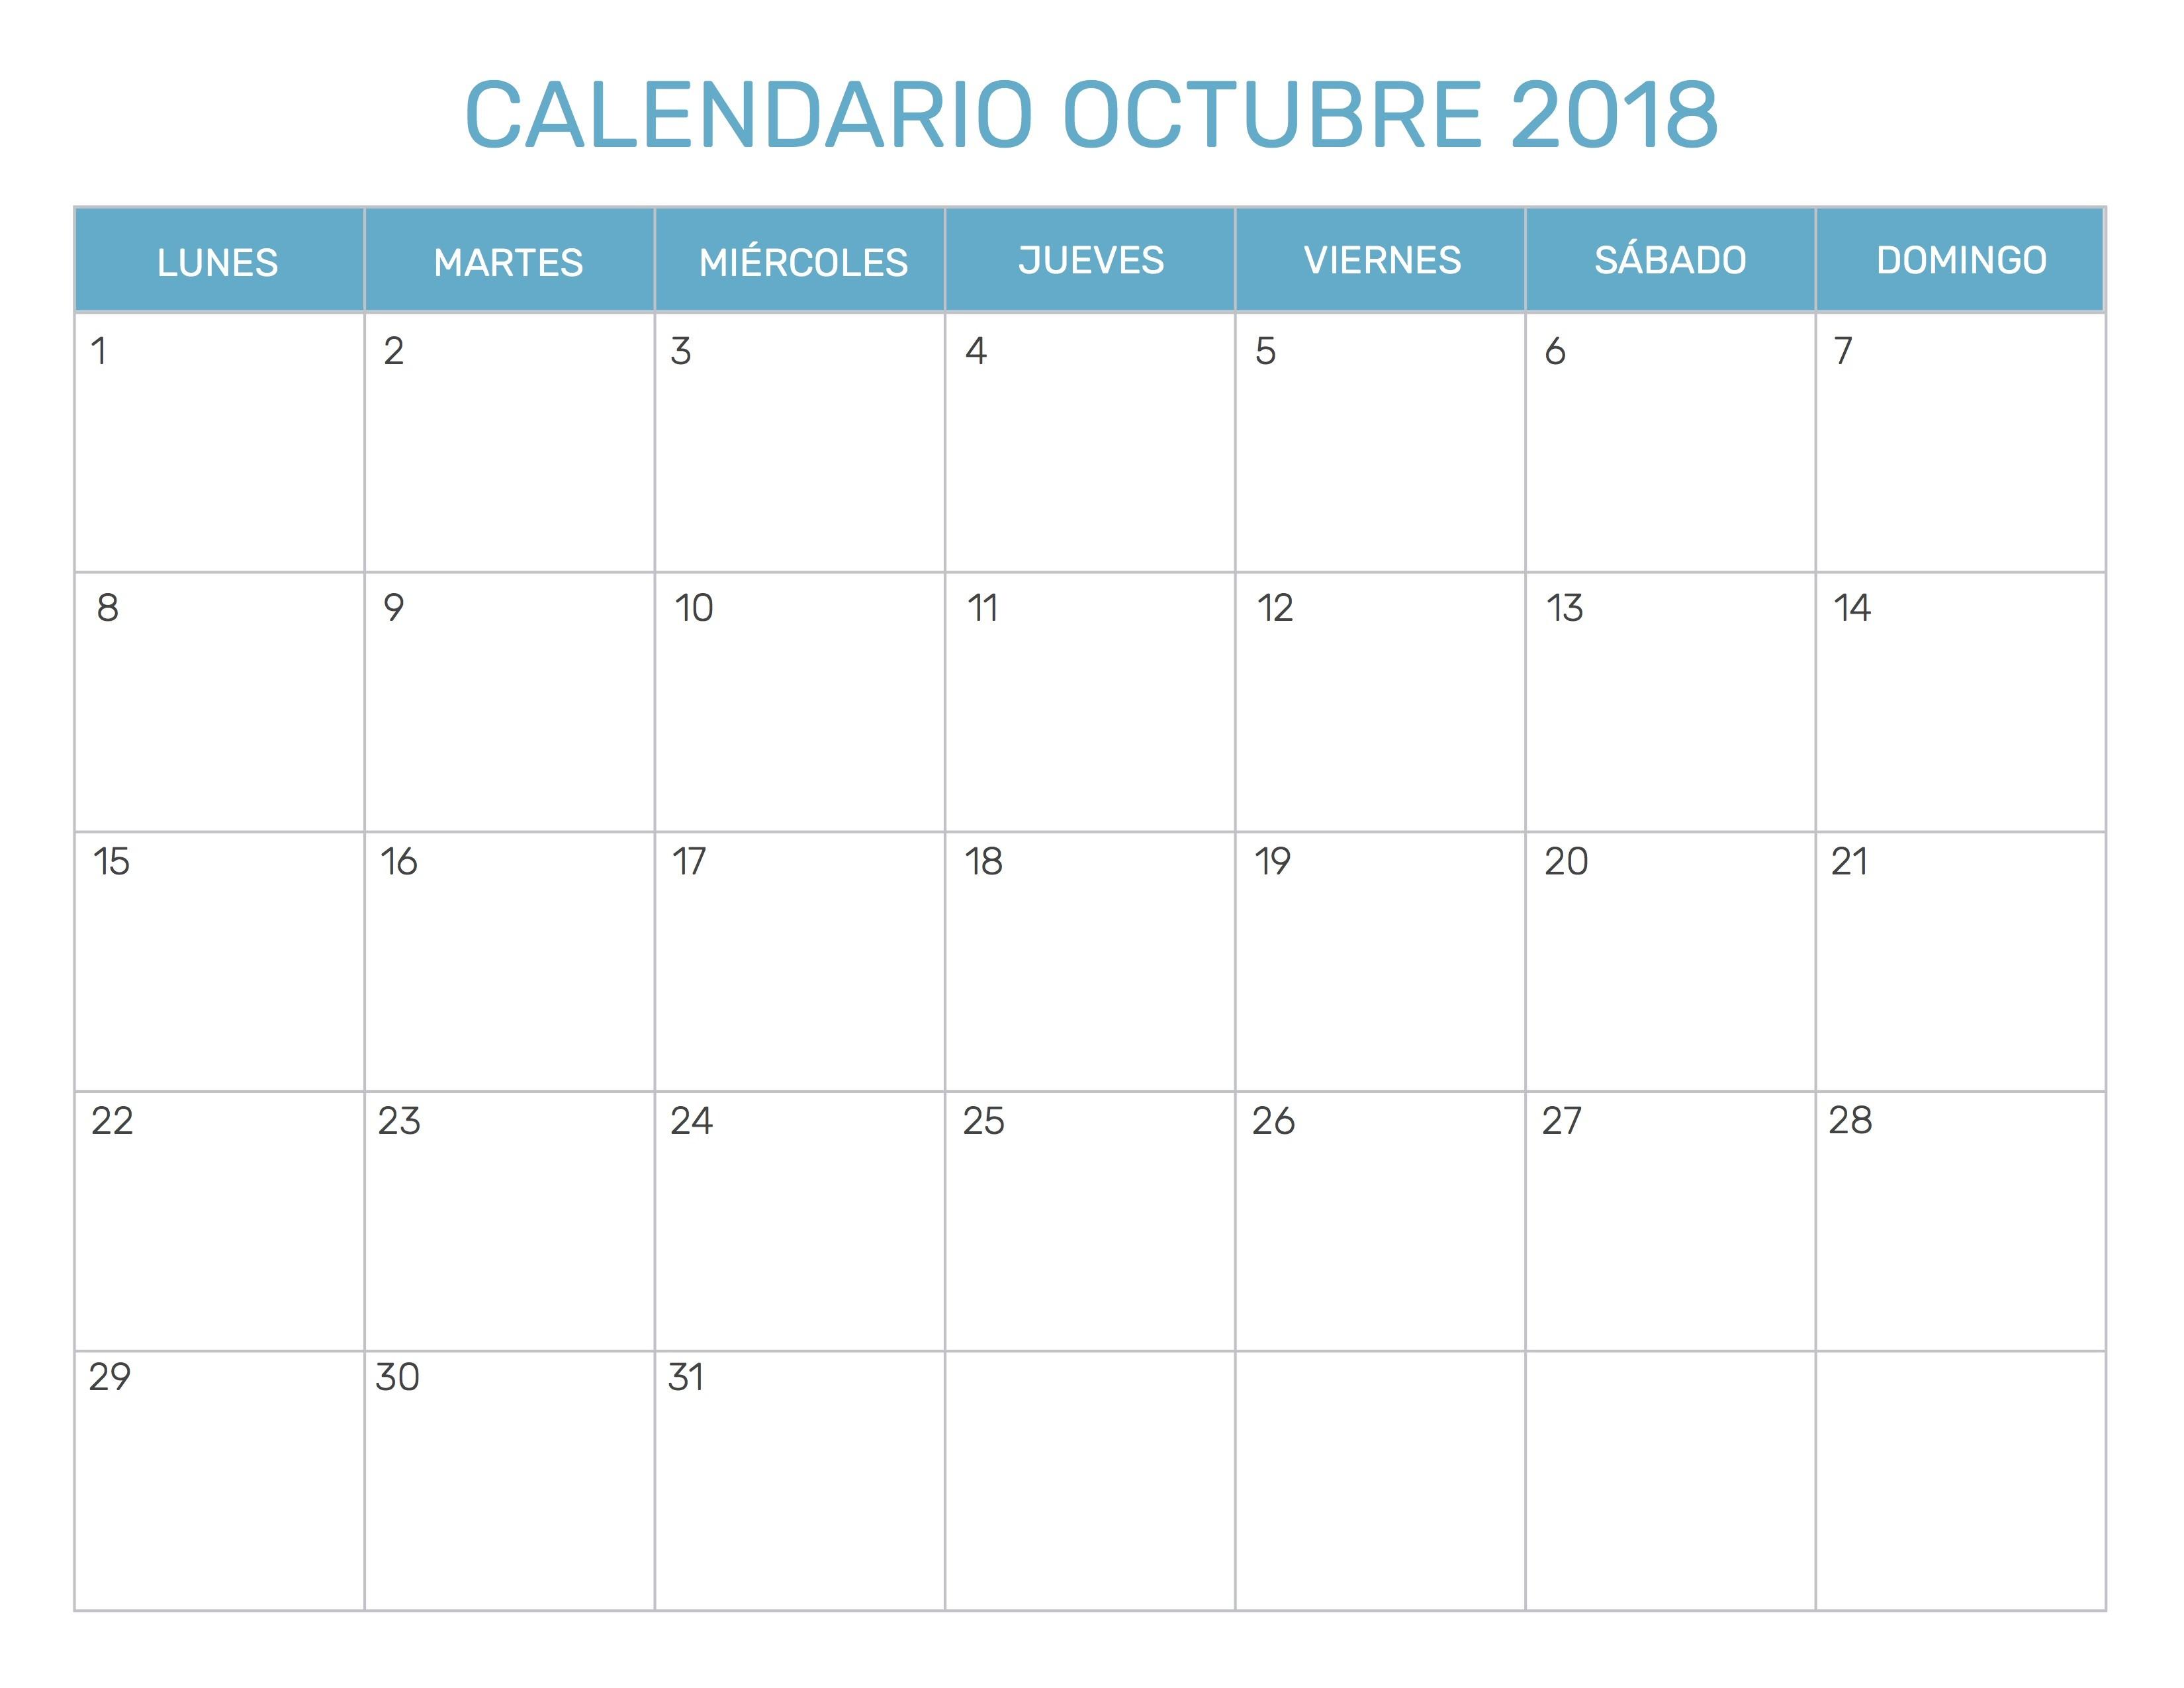 Calendario Octubre 2018 Pdf